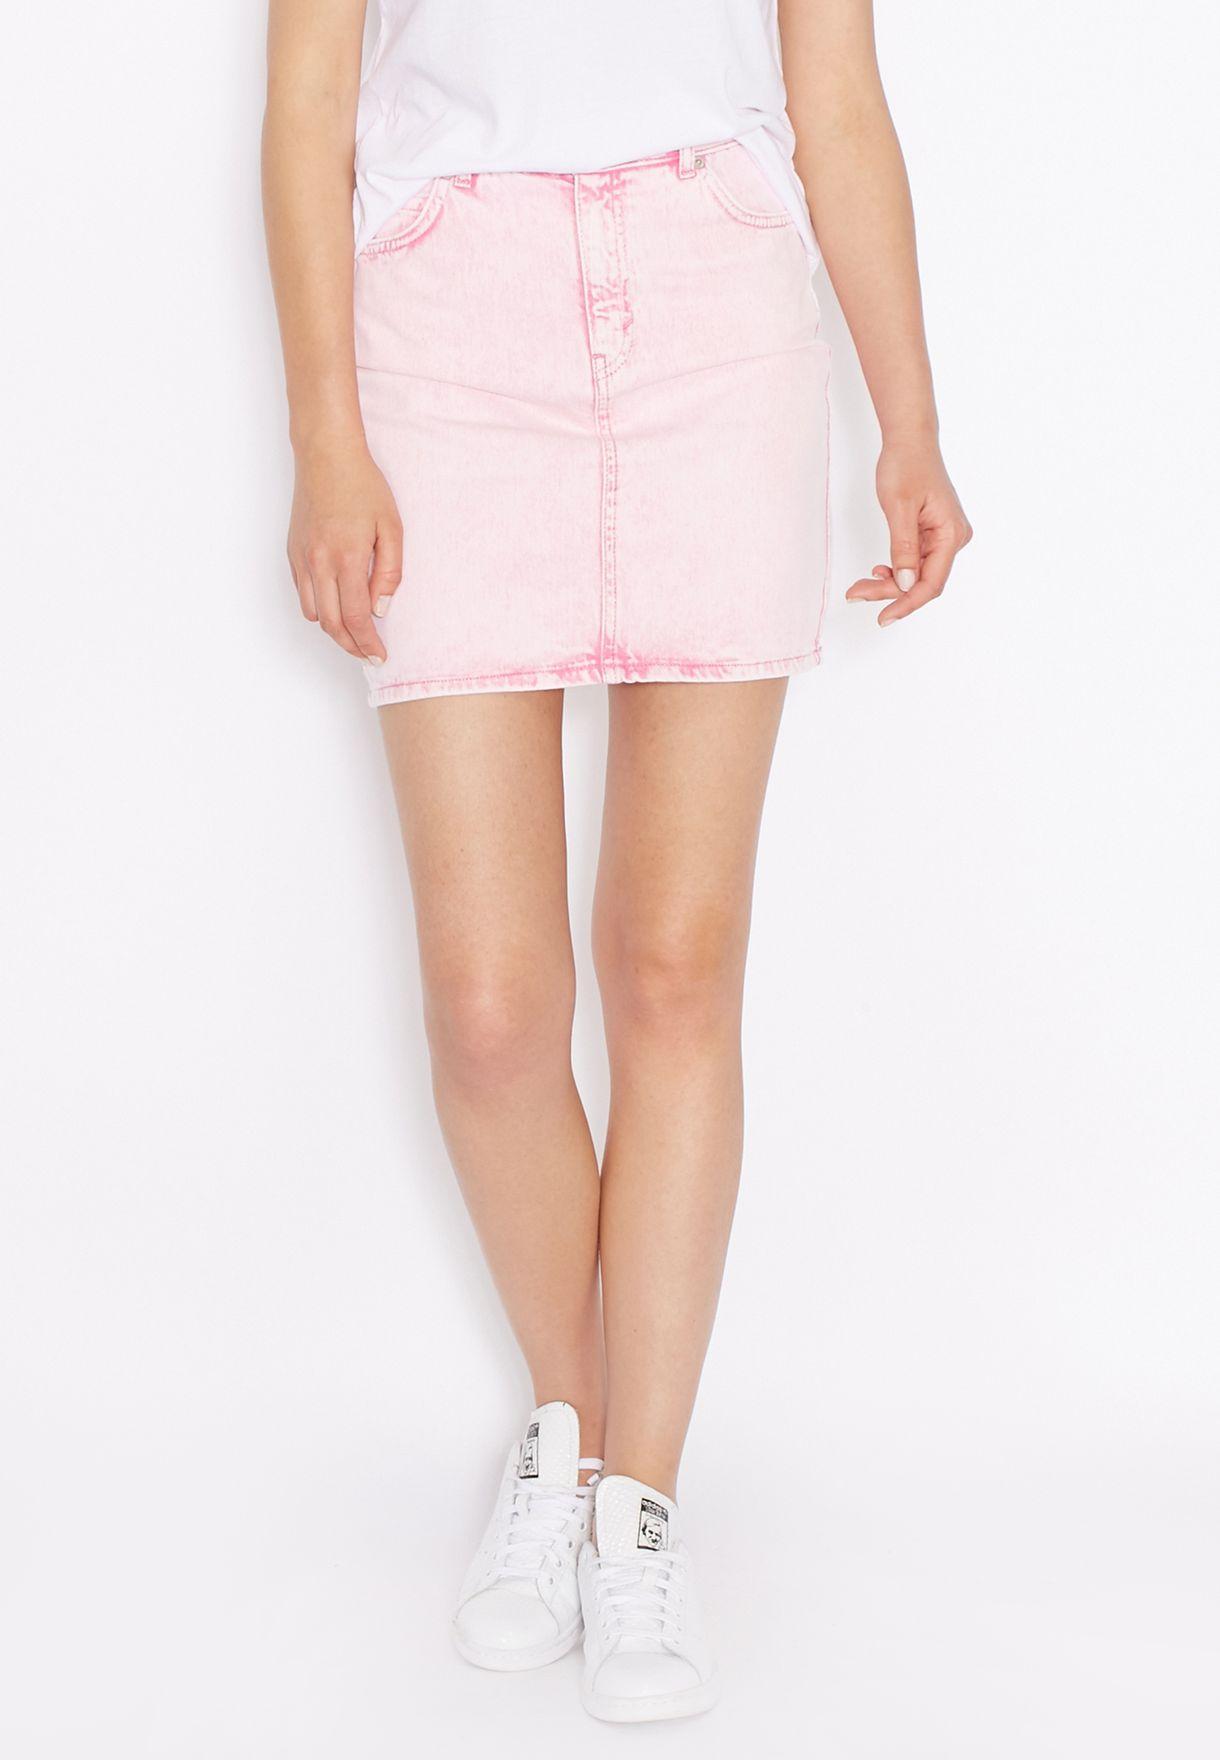 b6ff9119e9 Shop Topshop pink MOTO High Waisted Denim Skirt for Women in Qatar ...